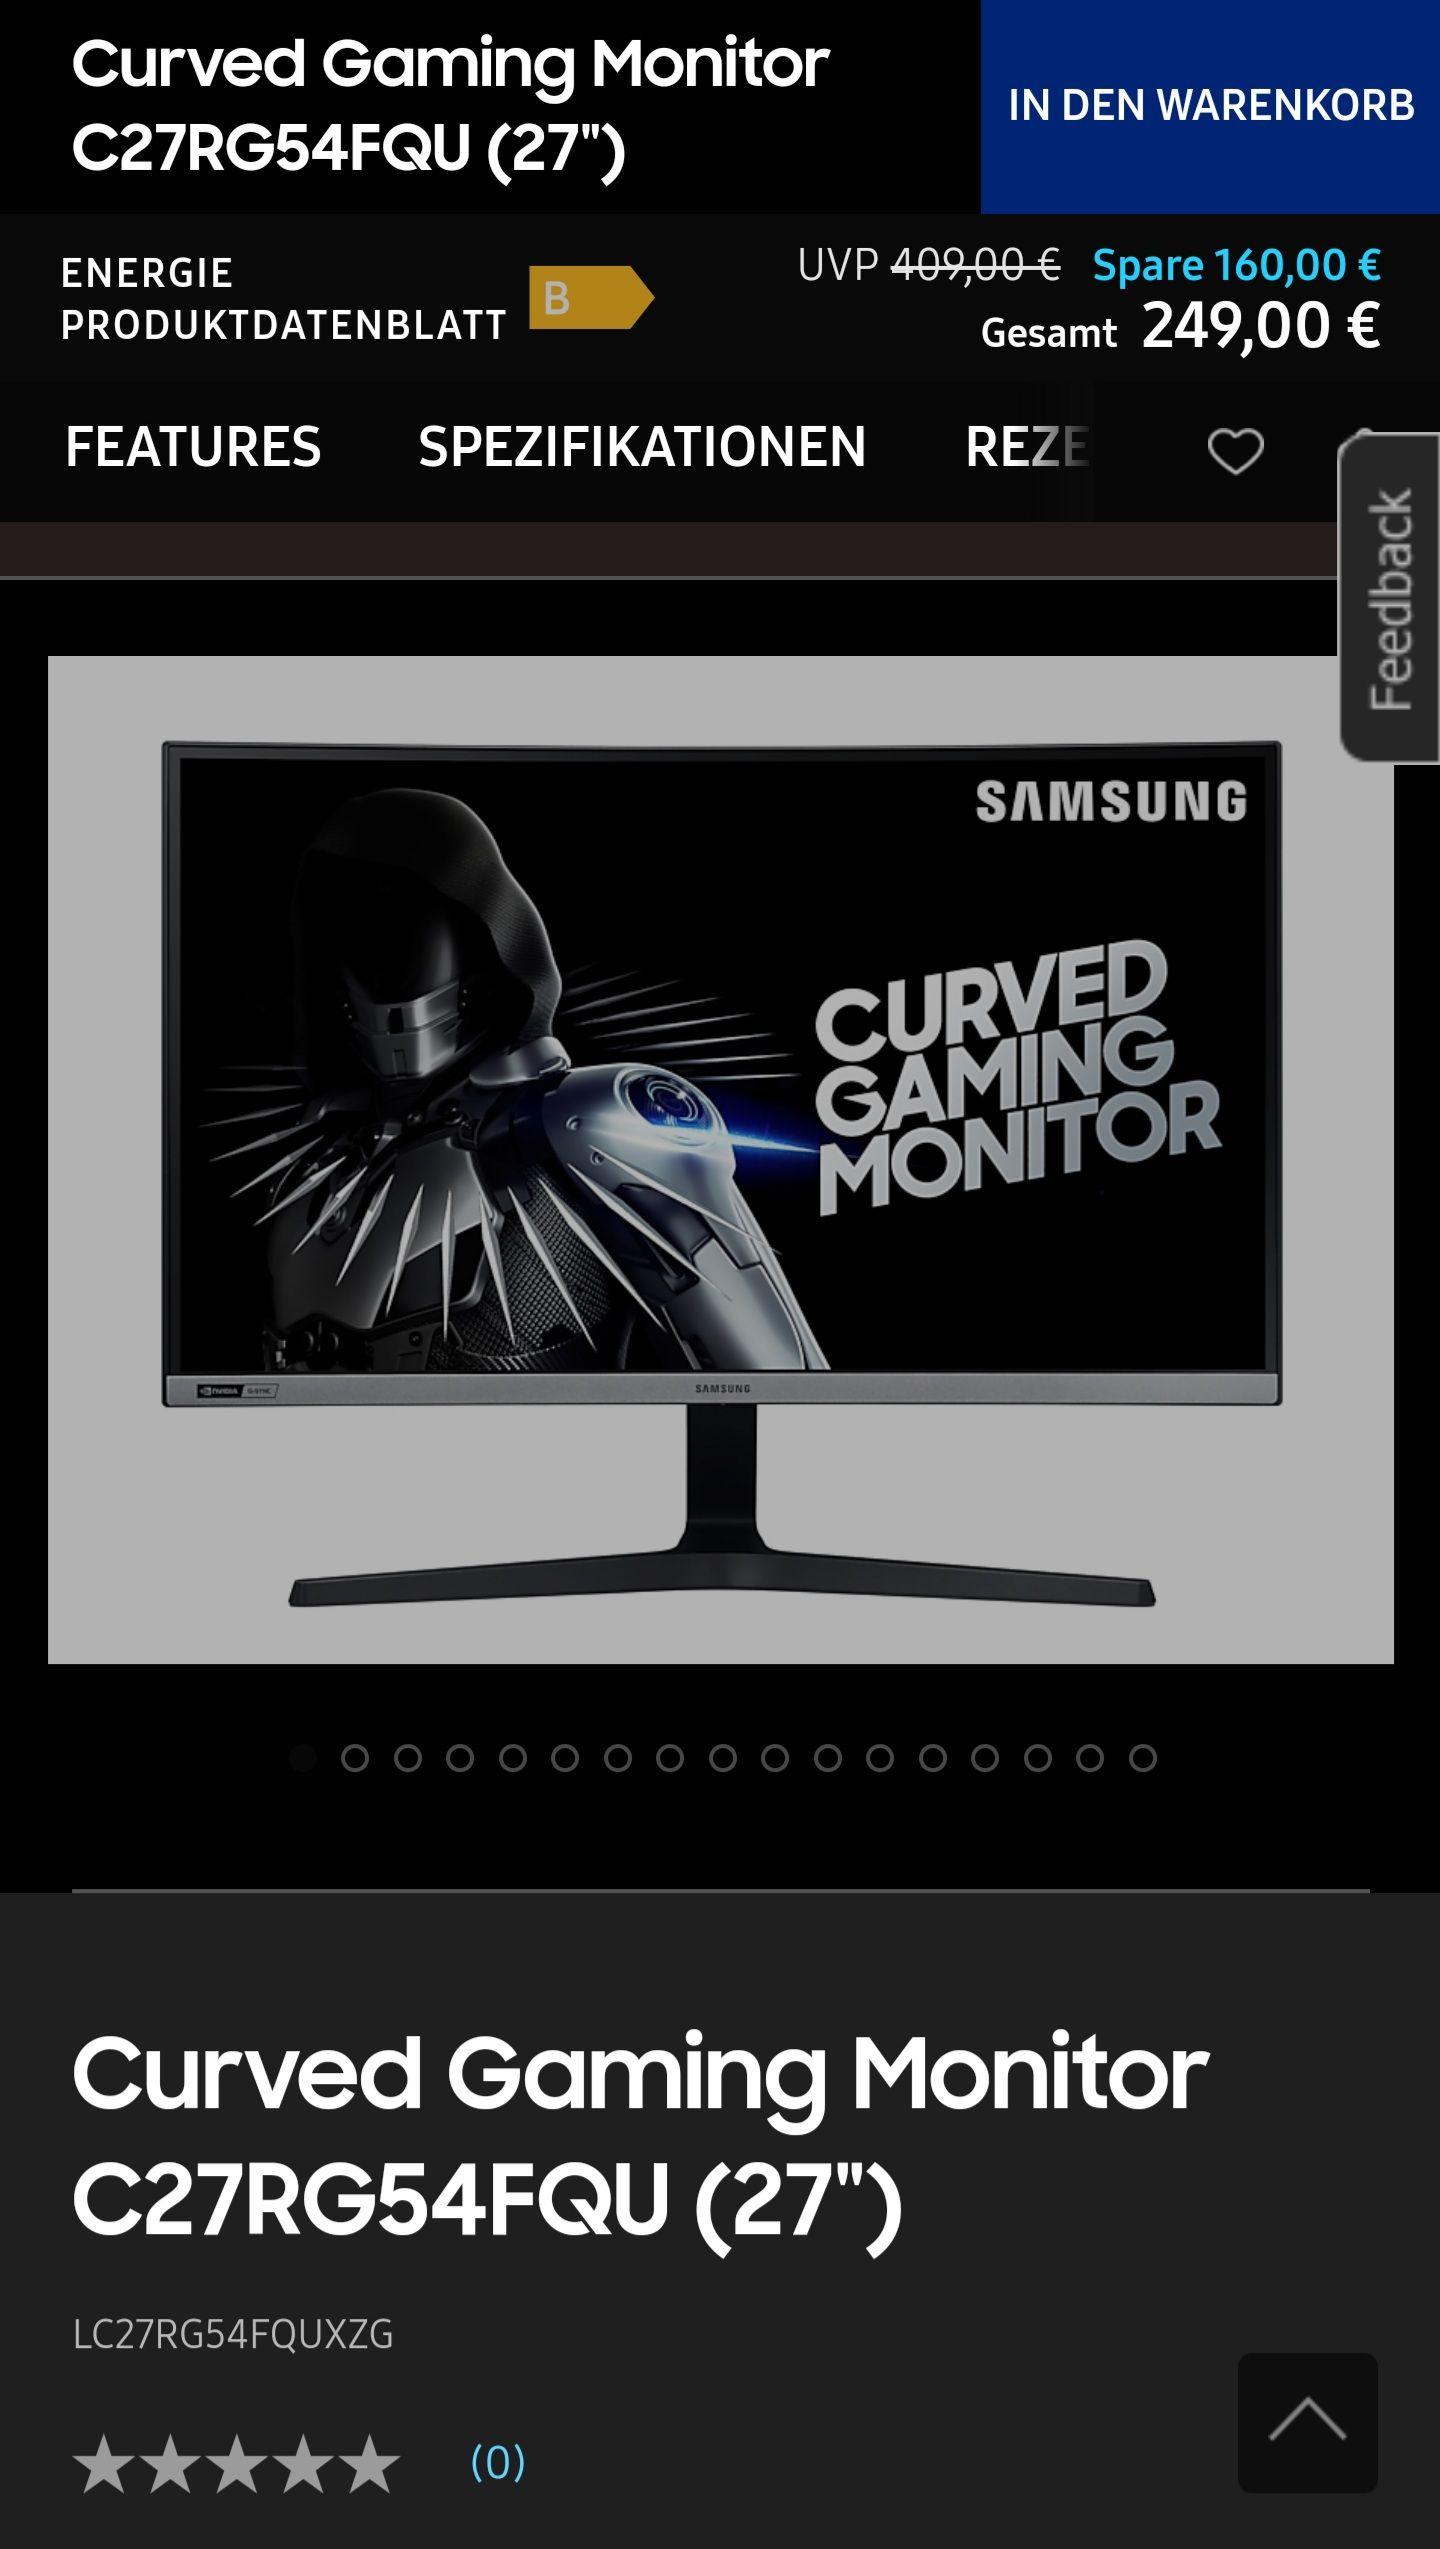 Samsung Curved Gaming Monitor 240hz FHD C27RG54FQU 27 Zoll G-Sync Kompatibel